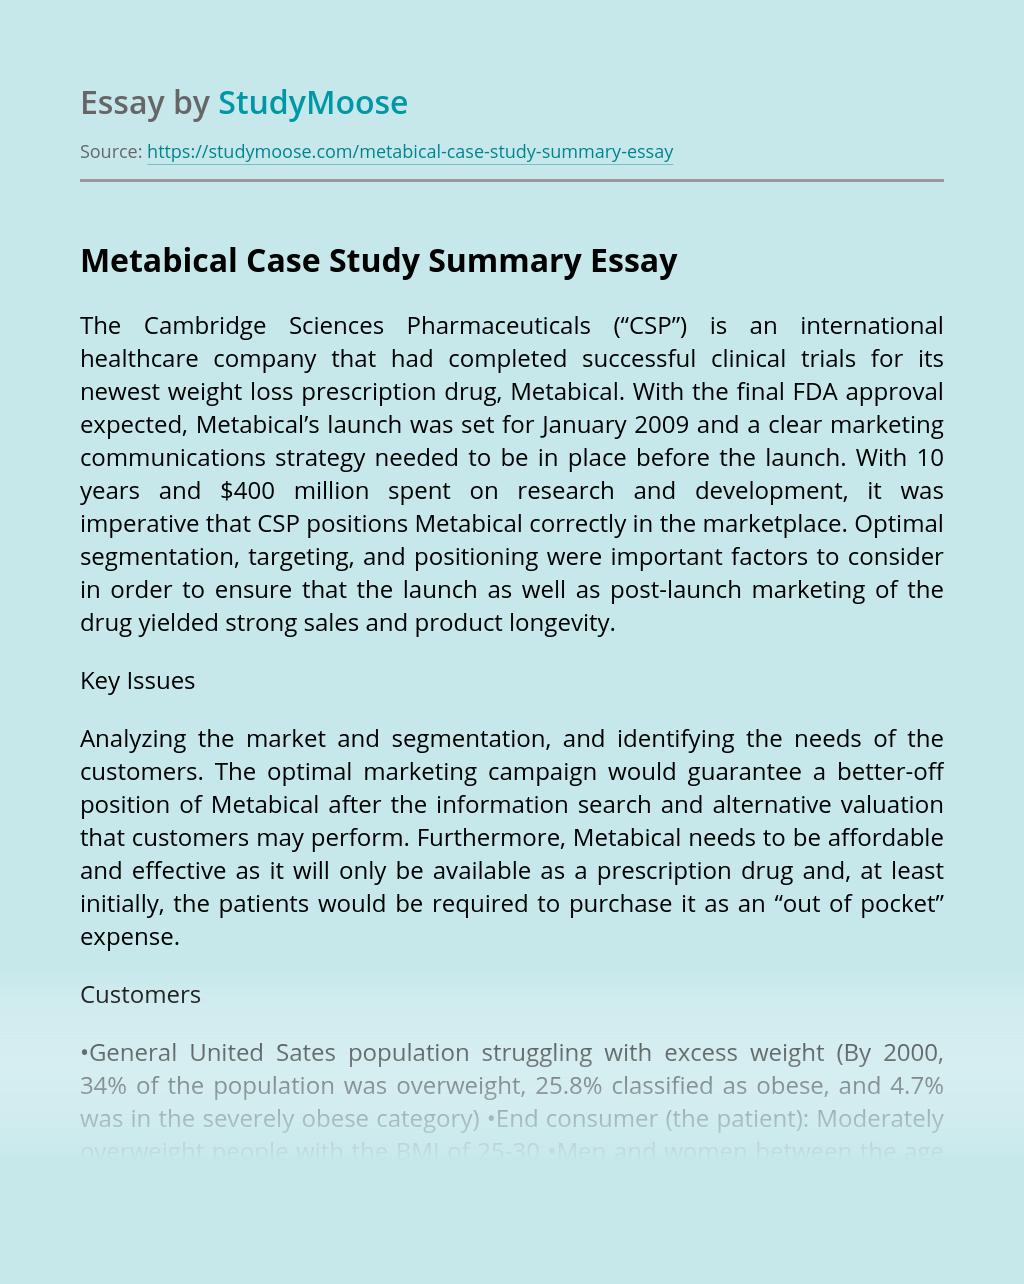 Metabical Case Study Summary